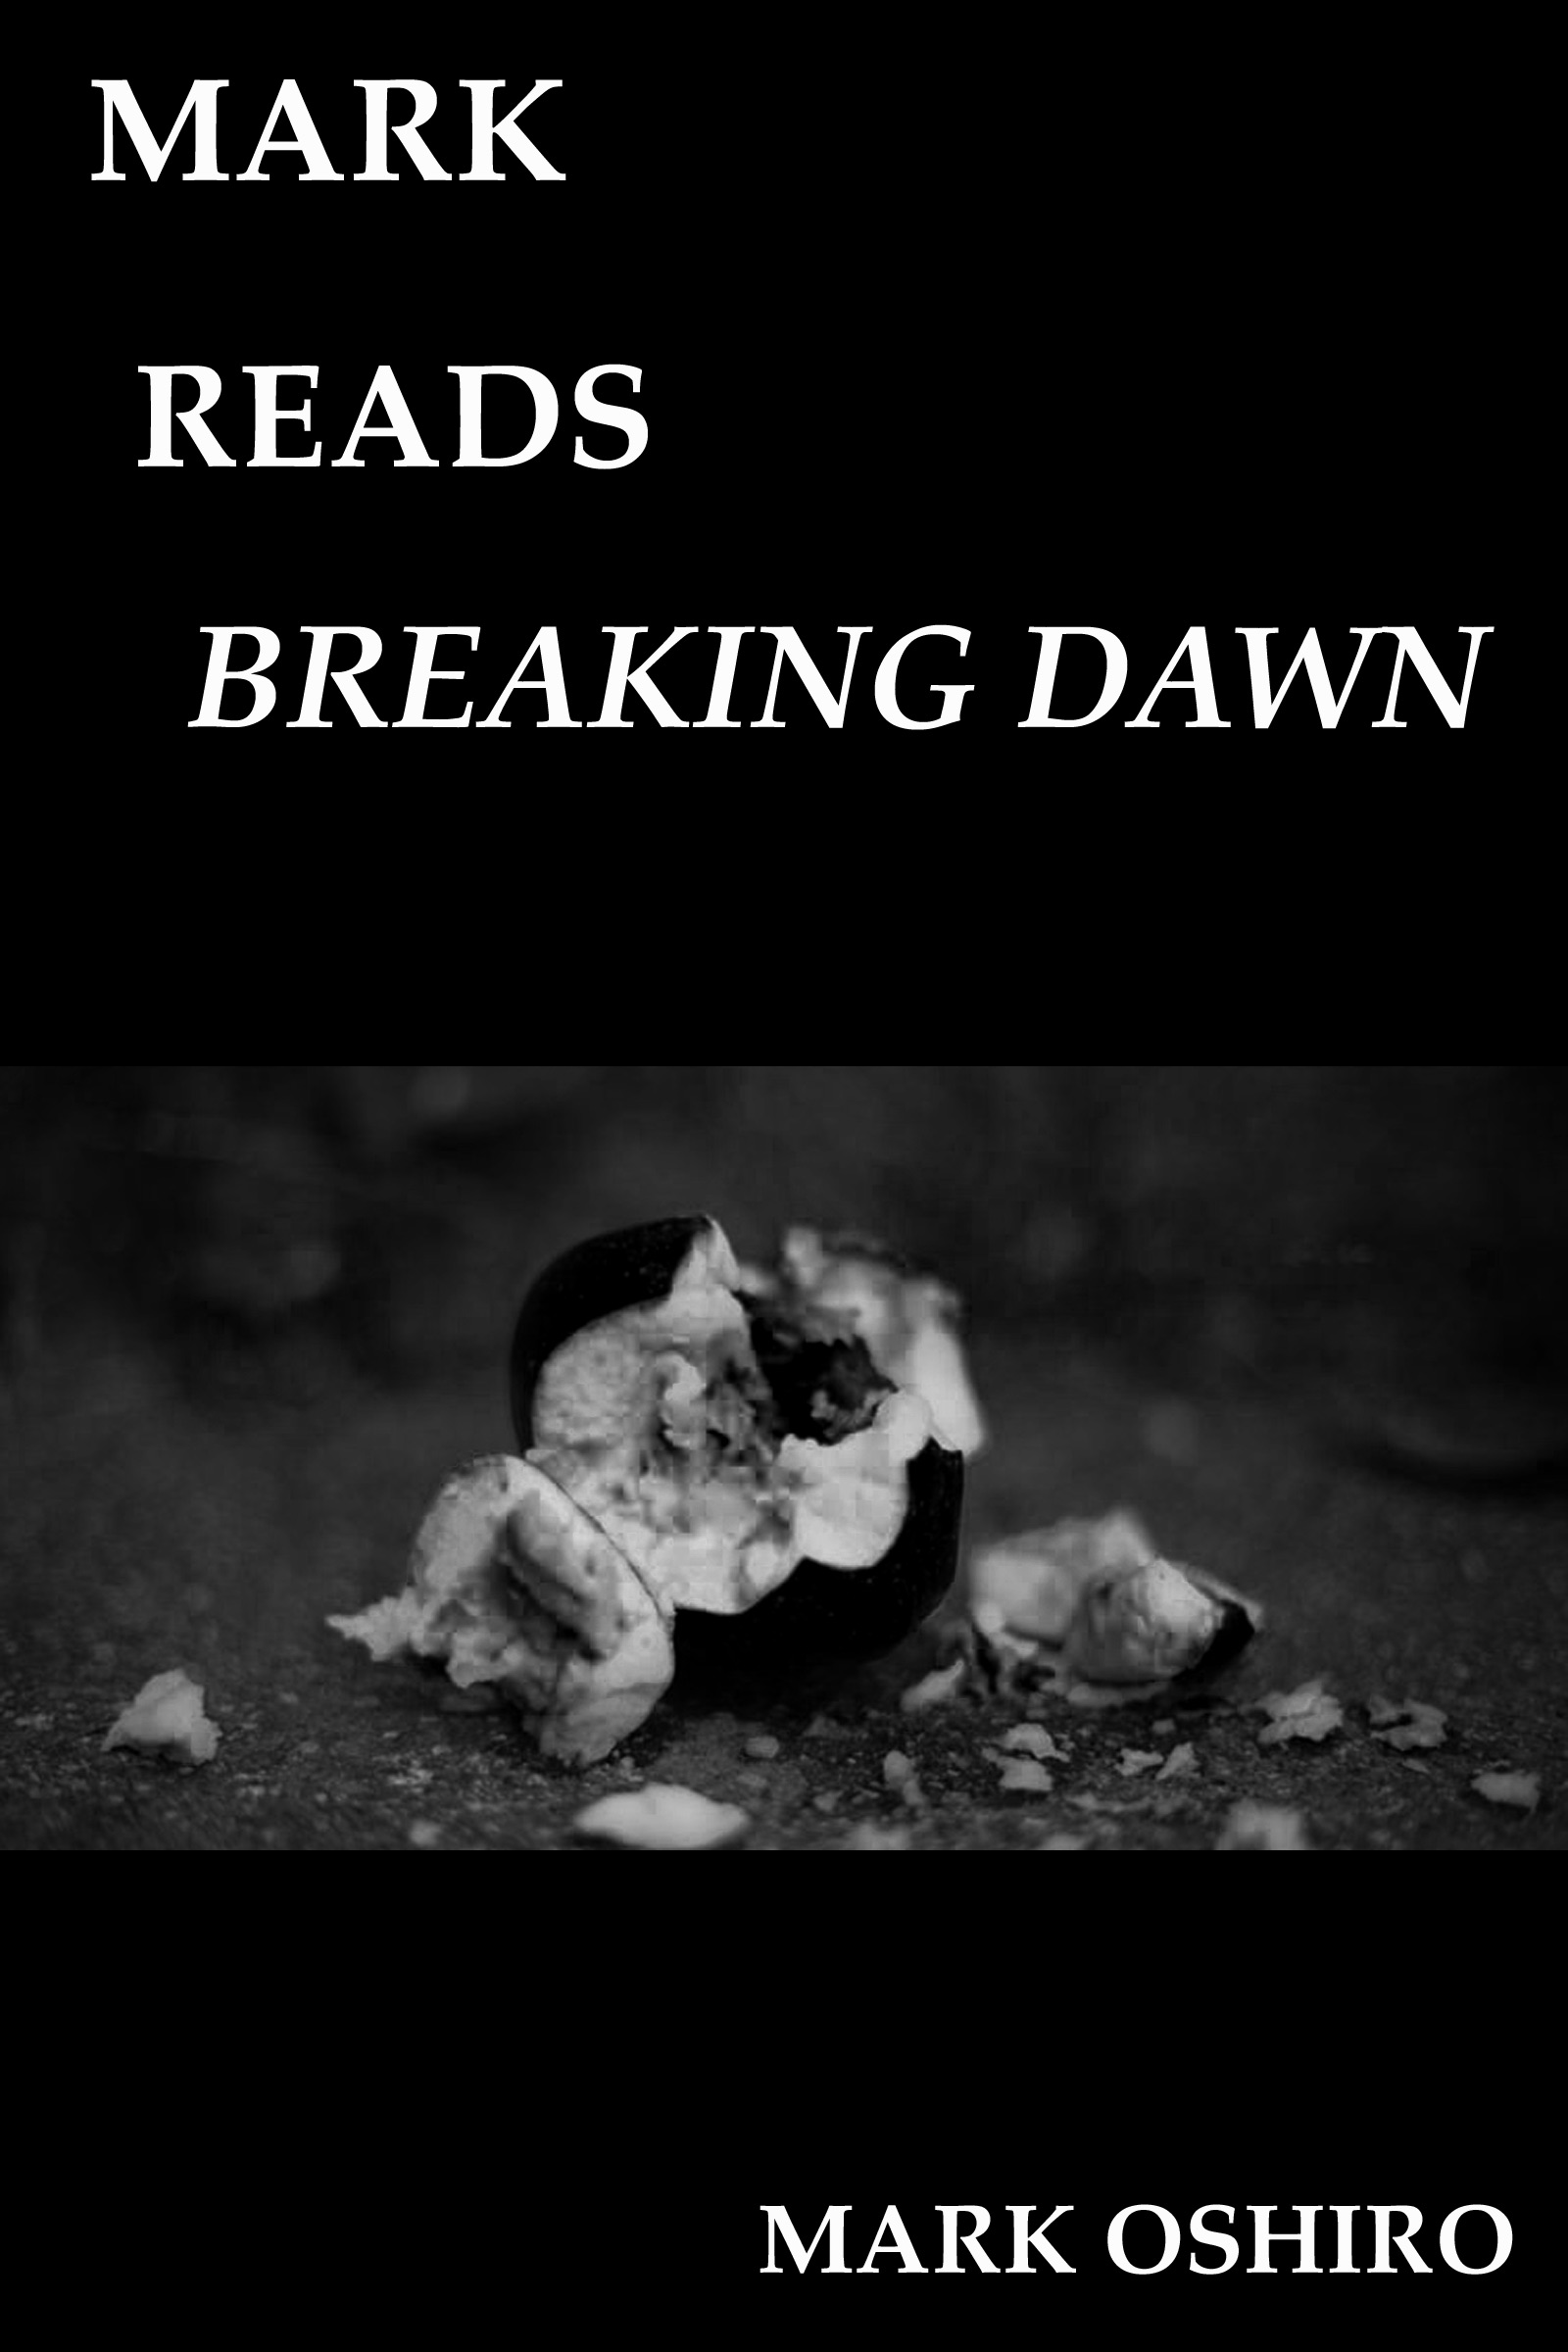 Twilight Breaking Dawn Book Cover